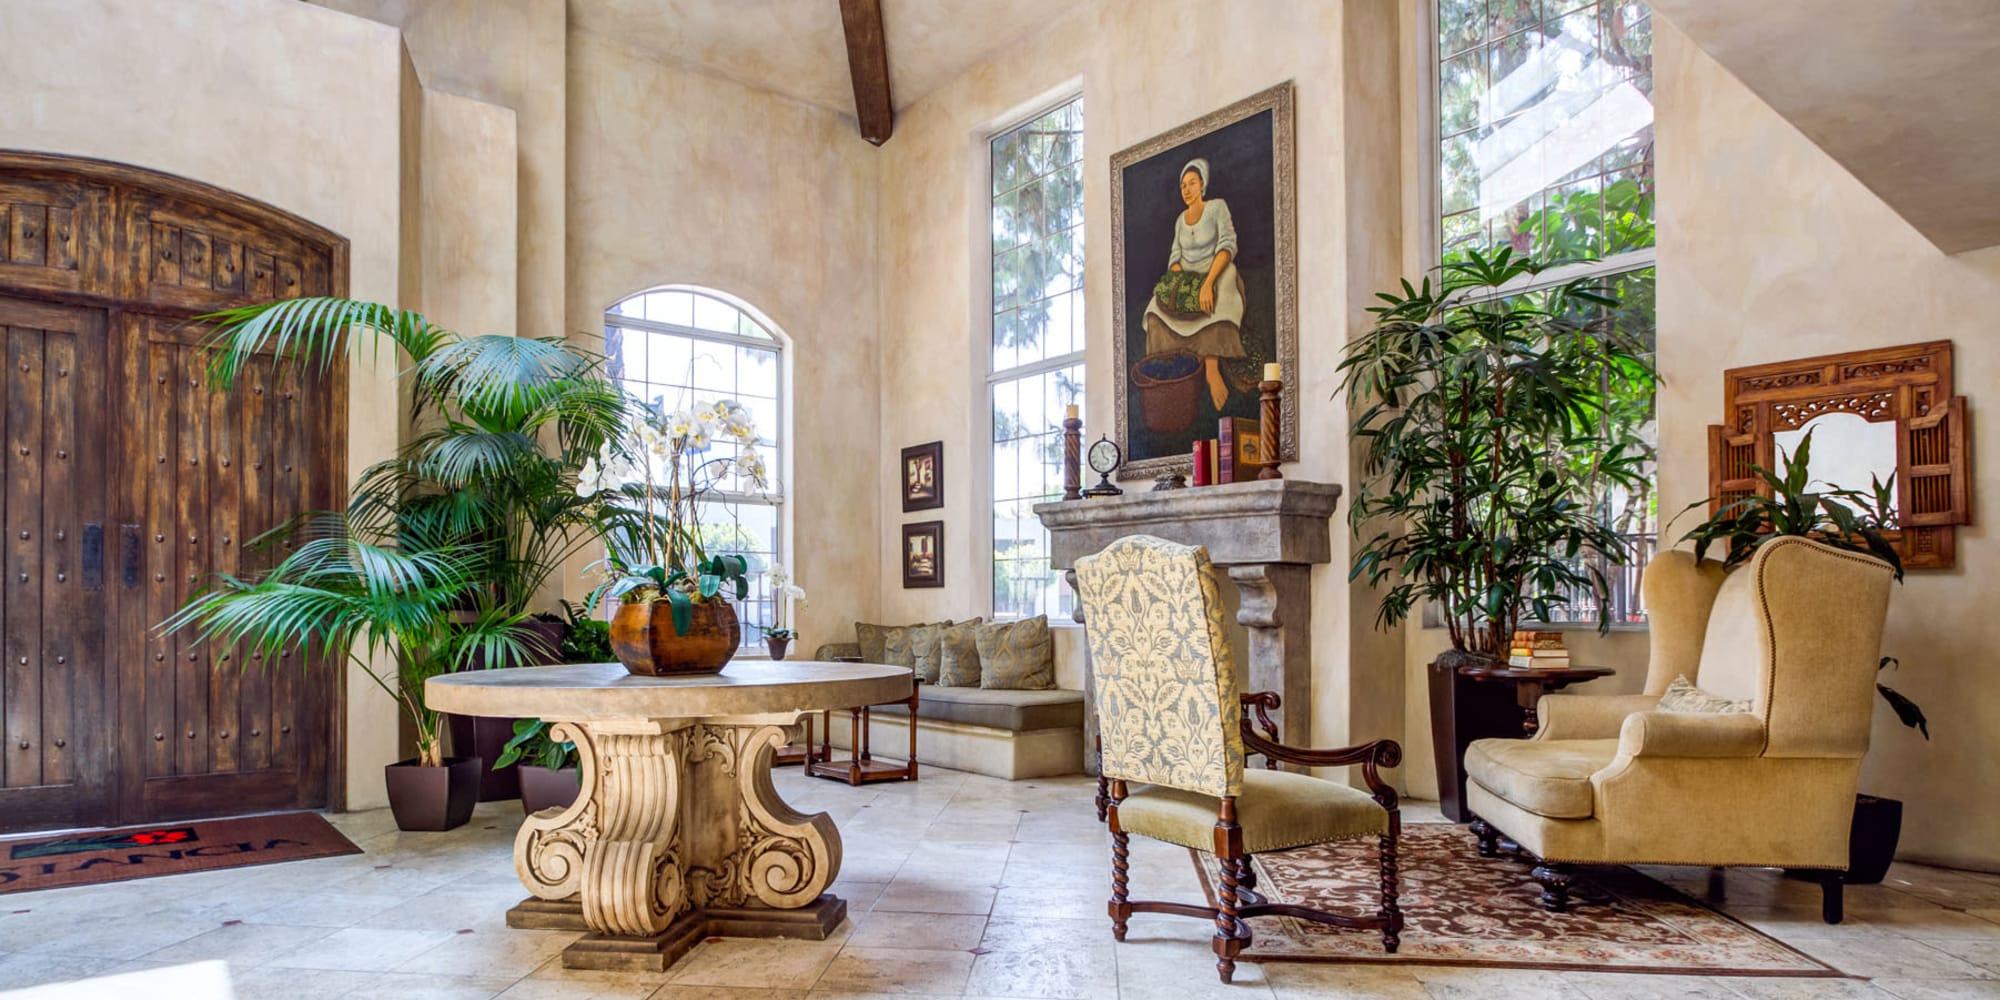 Beautifully decorated lobby interior at L'Estancia in Studio City, California